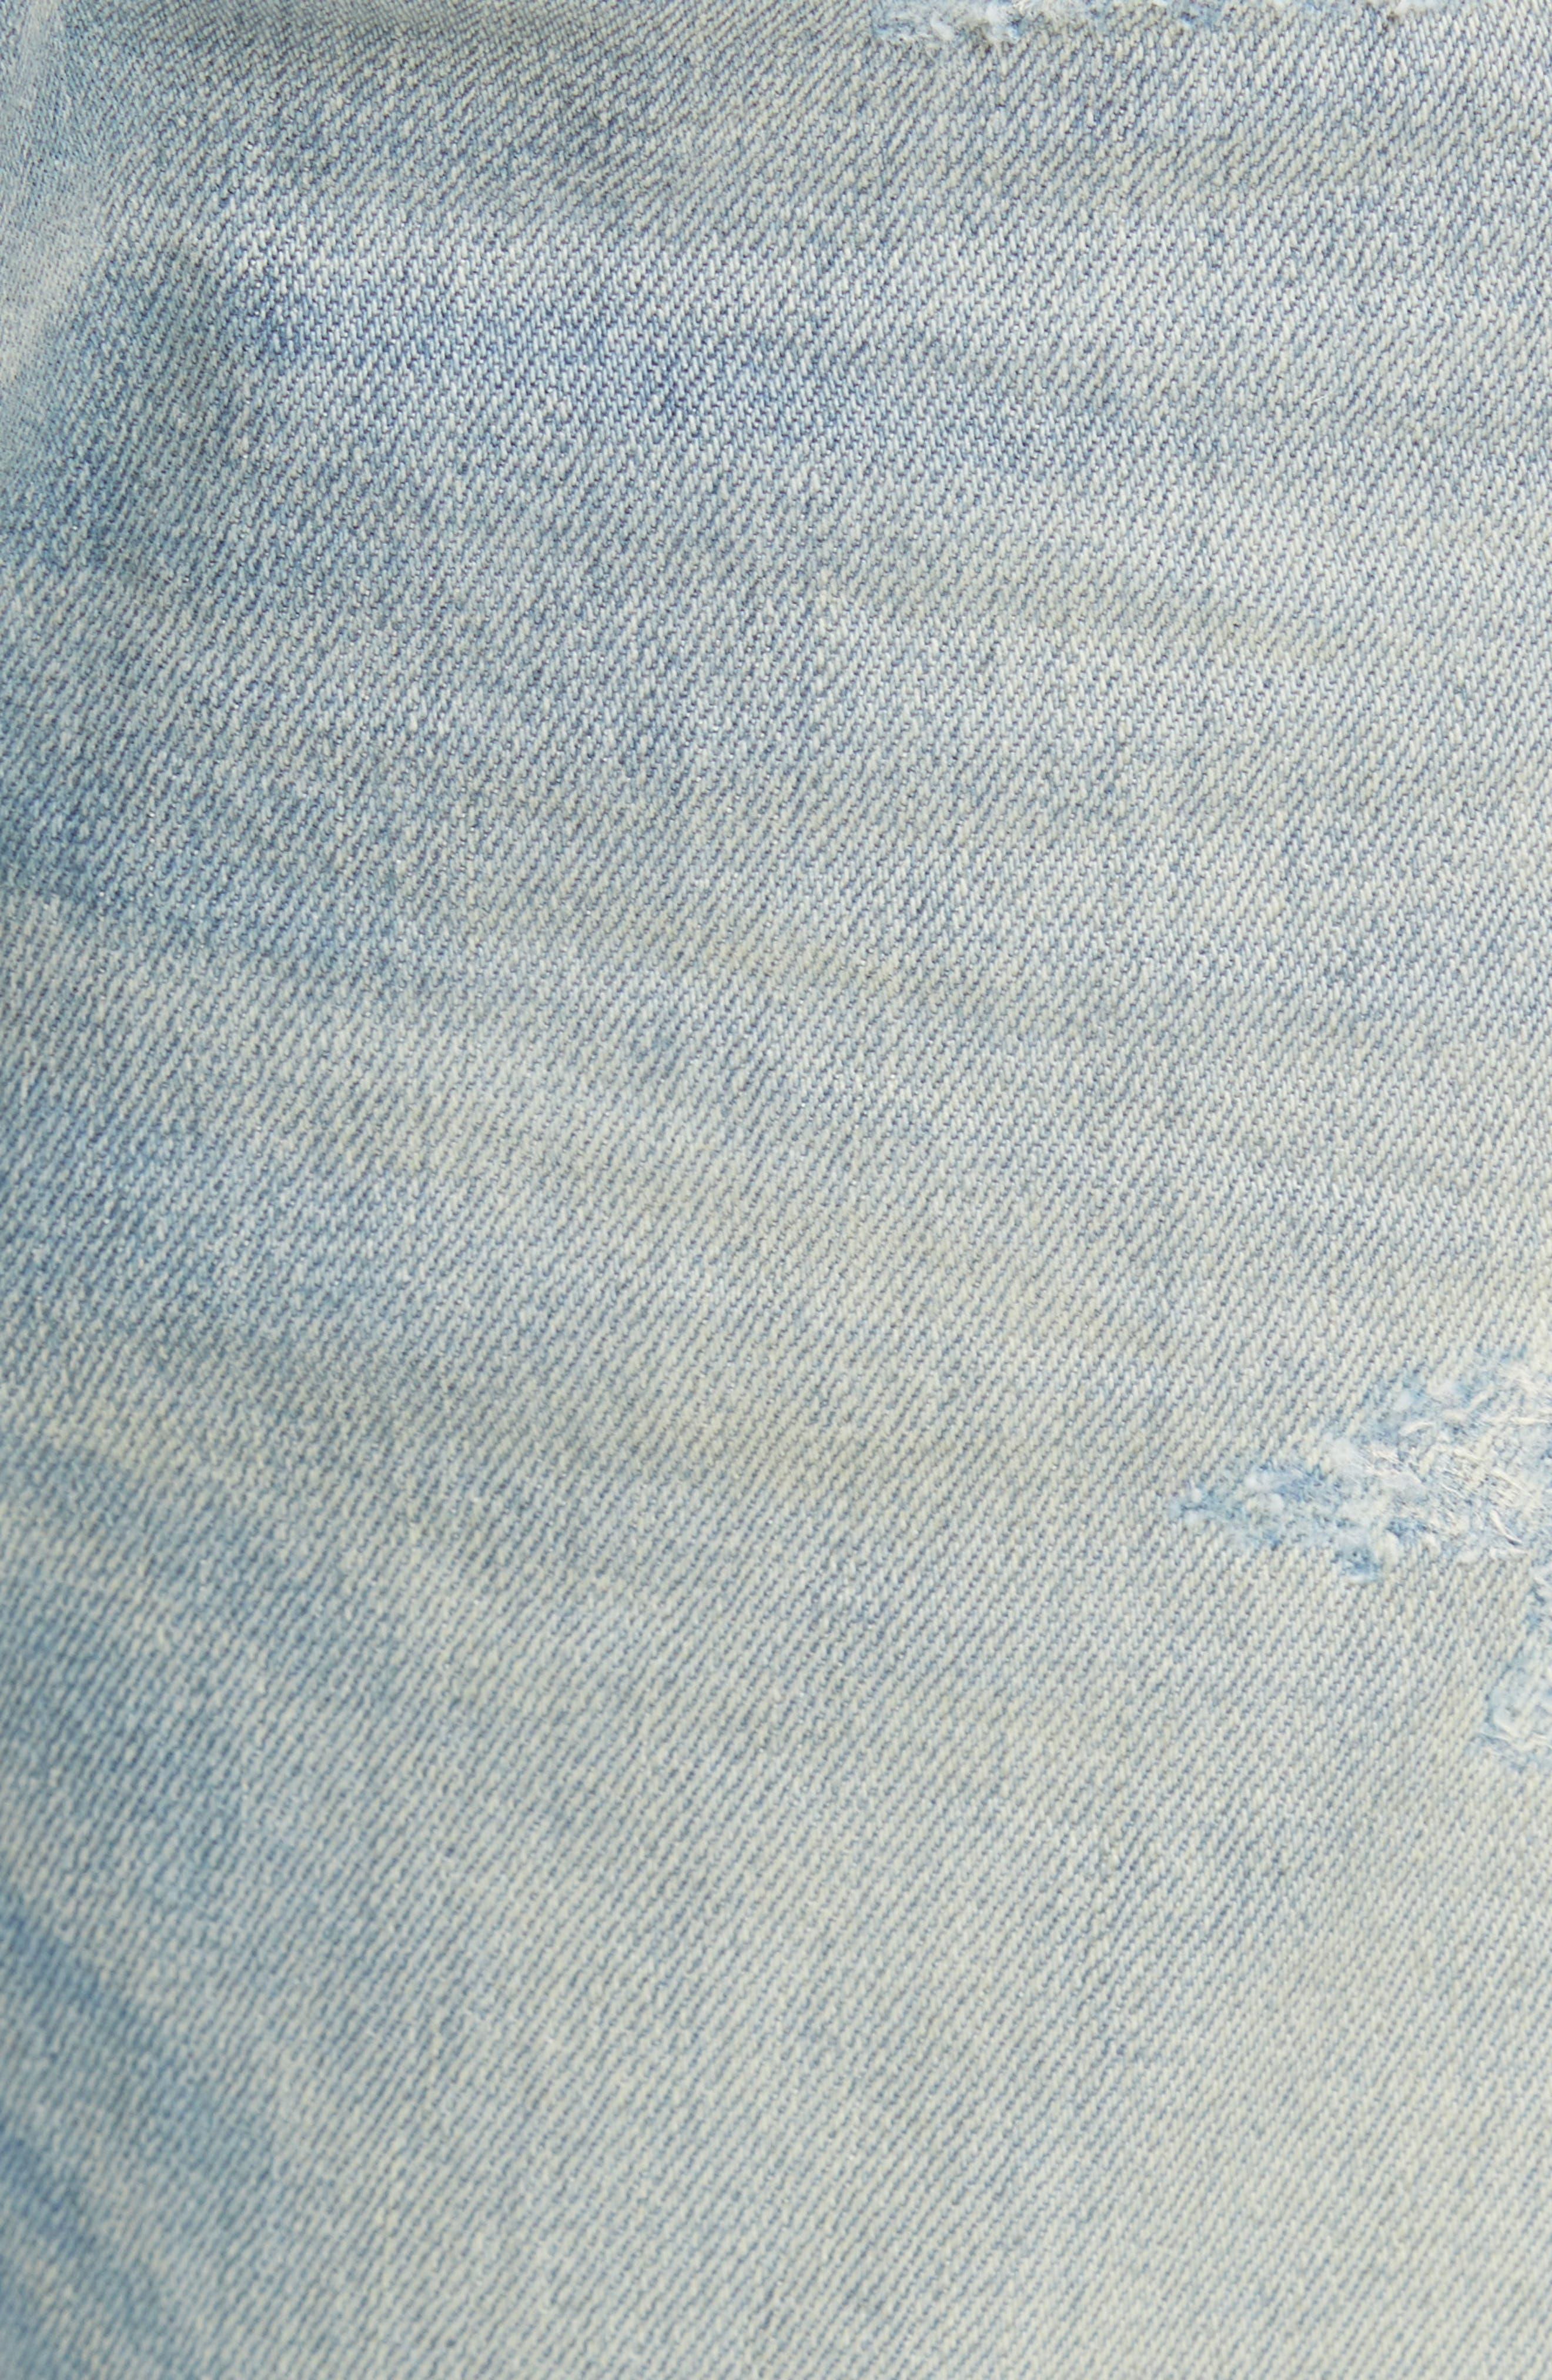 Windsor Slim Fit Jeans,                             Alternate thumbnail 5, color,                             LANGUID